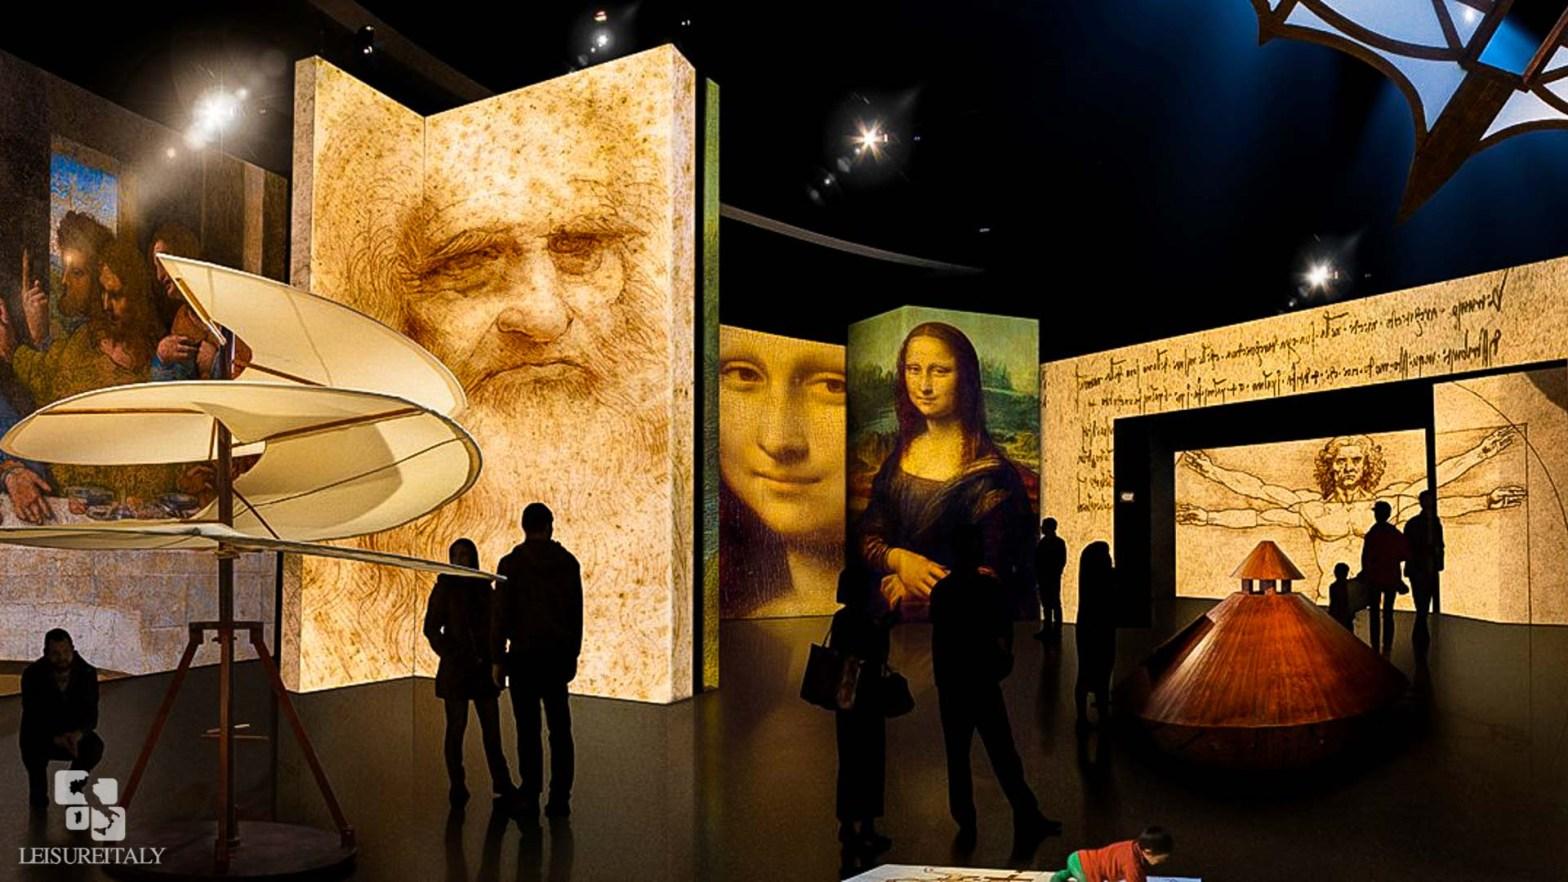 People viewing art at the Da Vinci museum